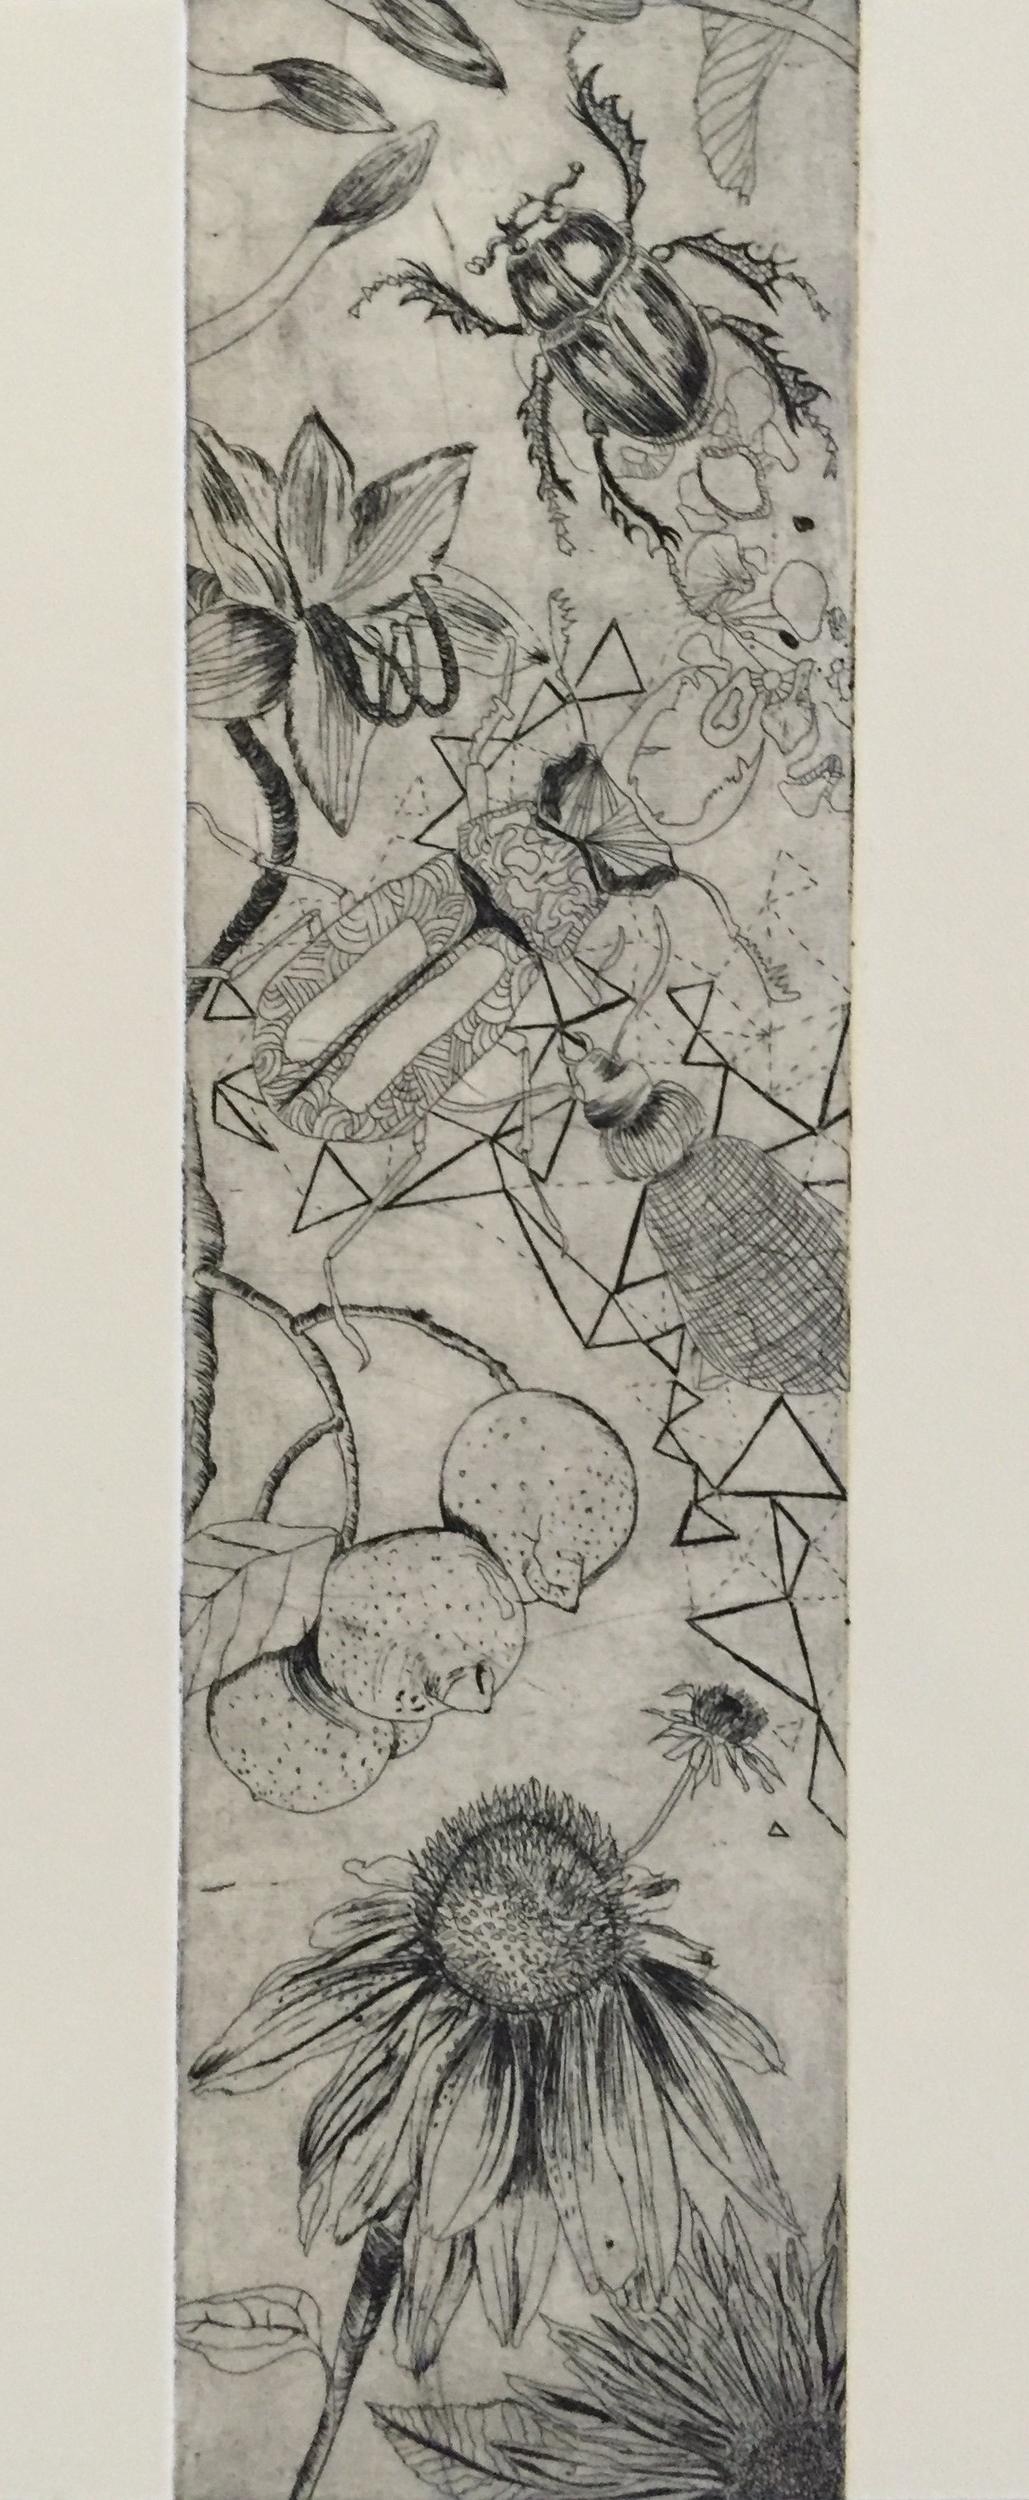 YAMATA BERNARD   For Her   etching